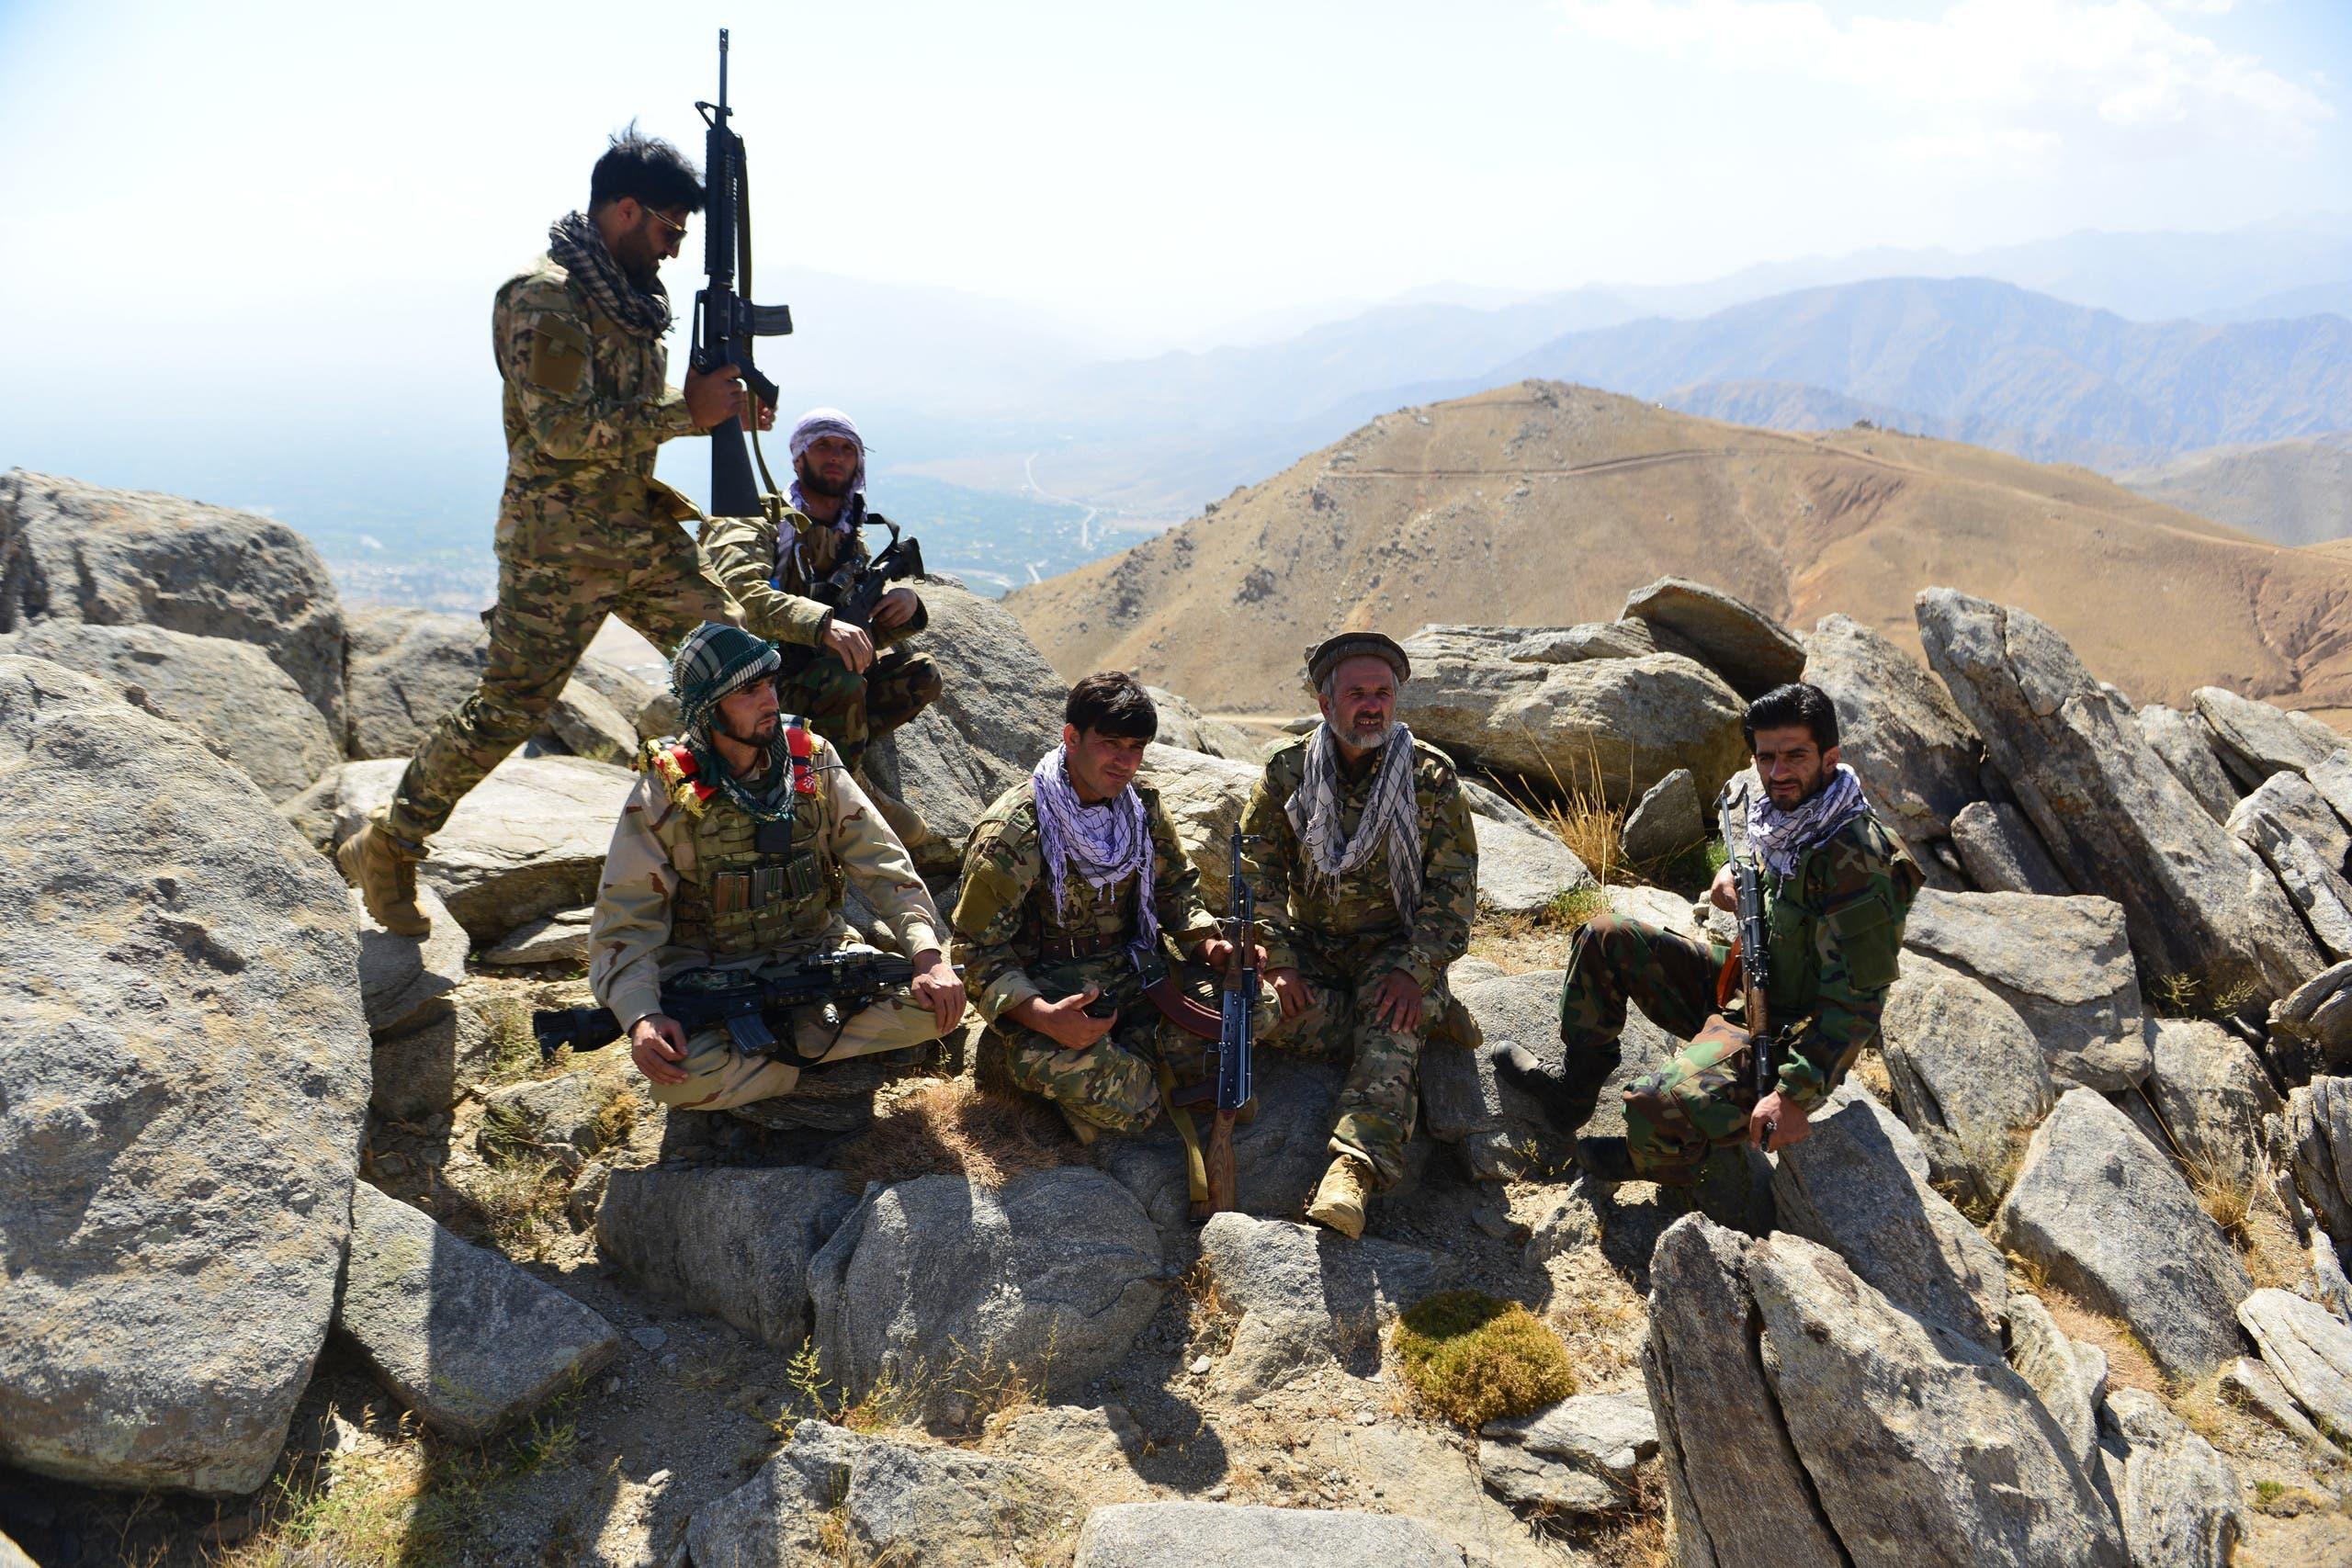 Panjshir resistance: 115 Taliban fighters killed and 35 captured